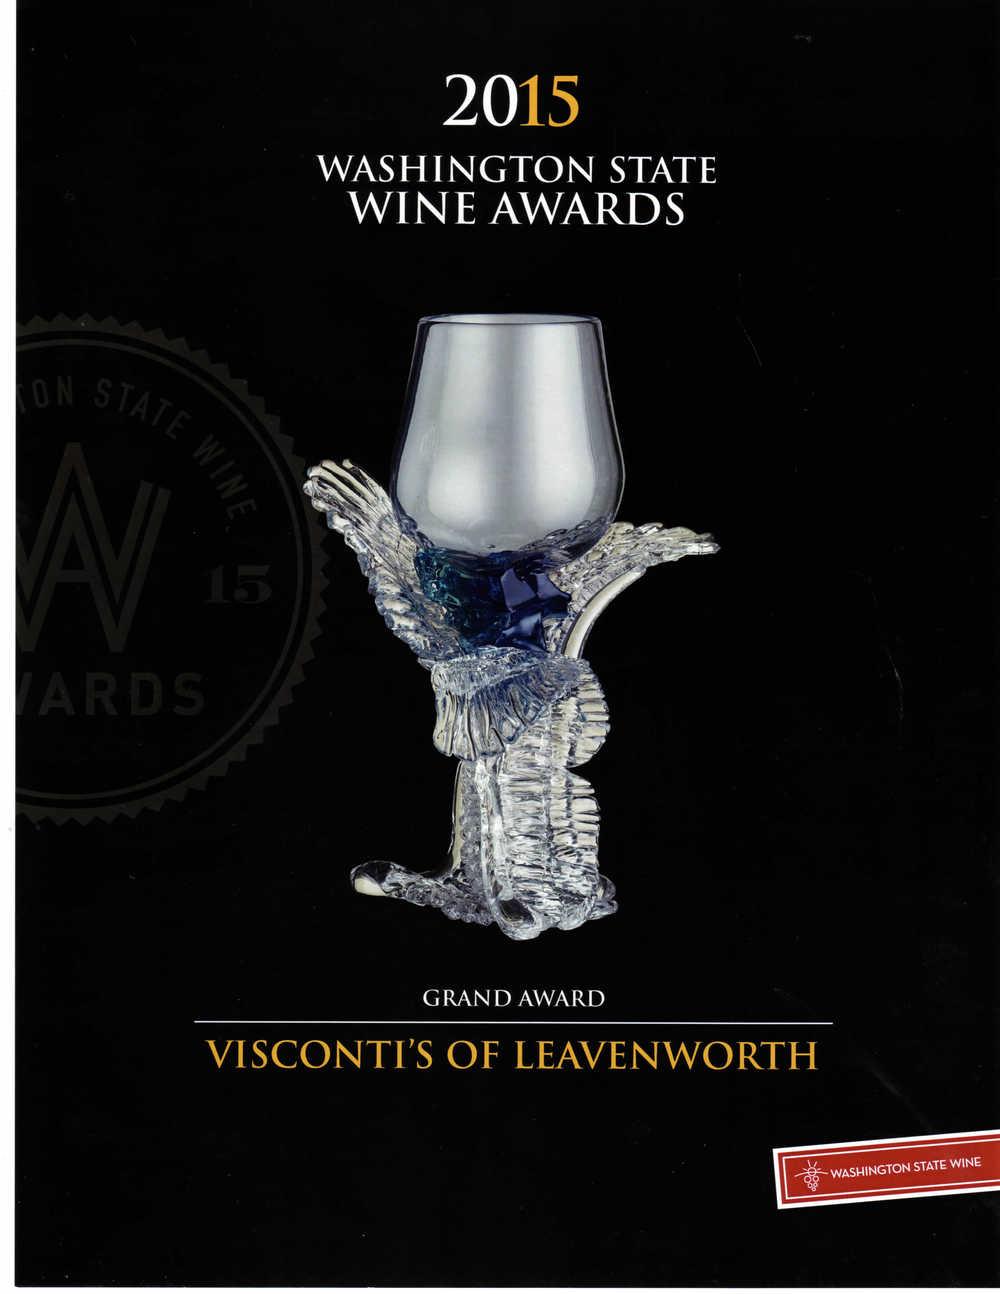 2015 Wine Award.jpg